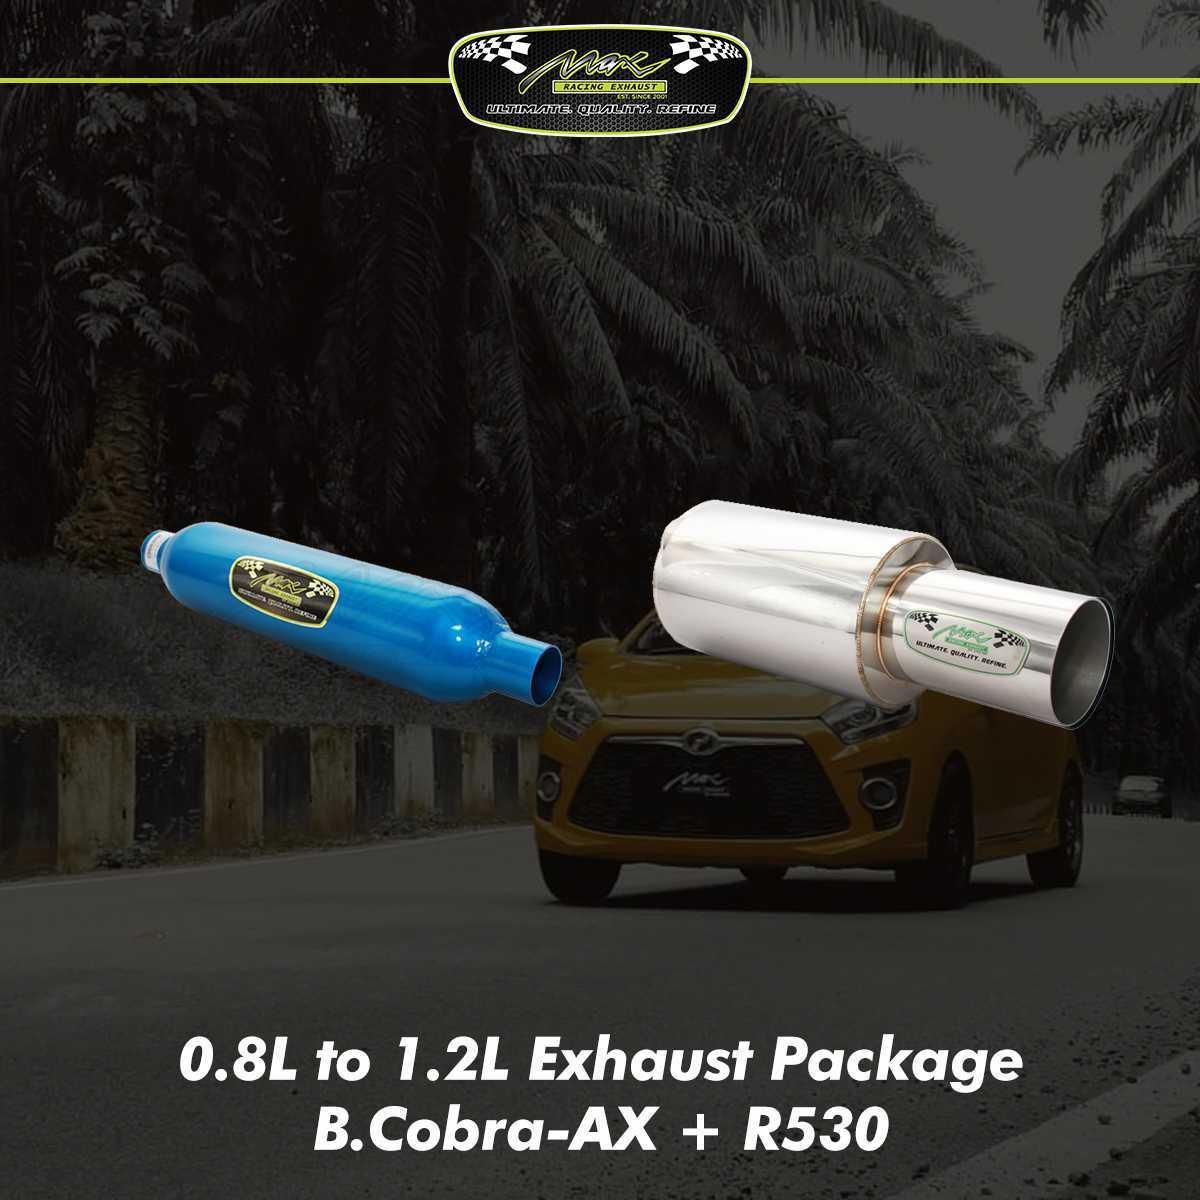 Perodua Axia Exhaust Package  Max Racing Exhaust